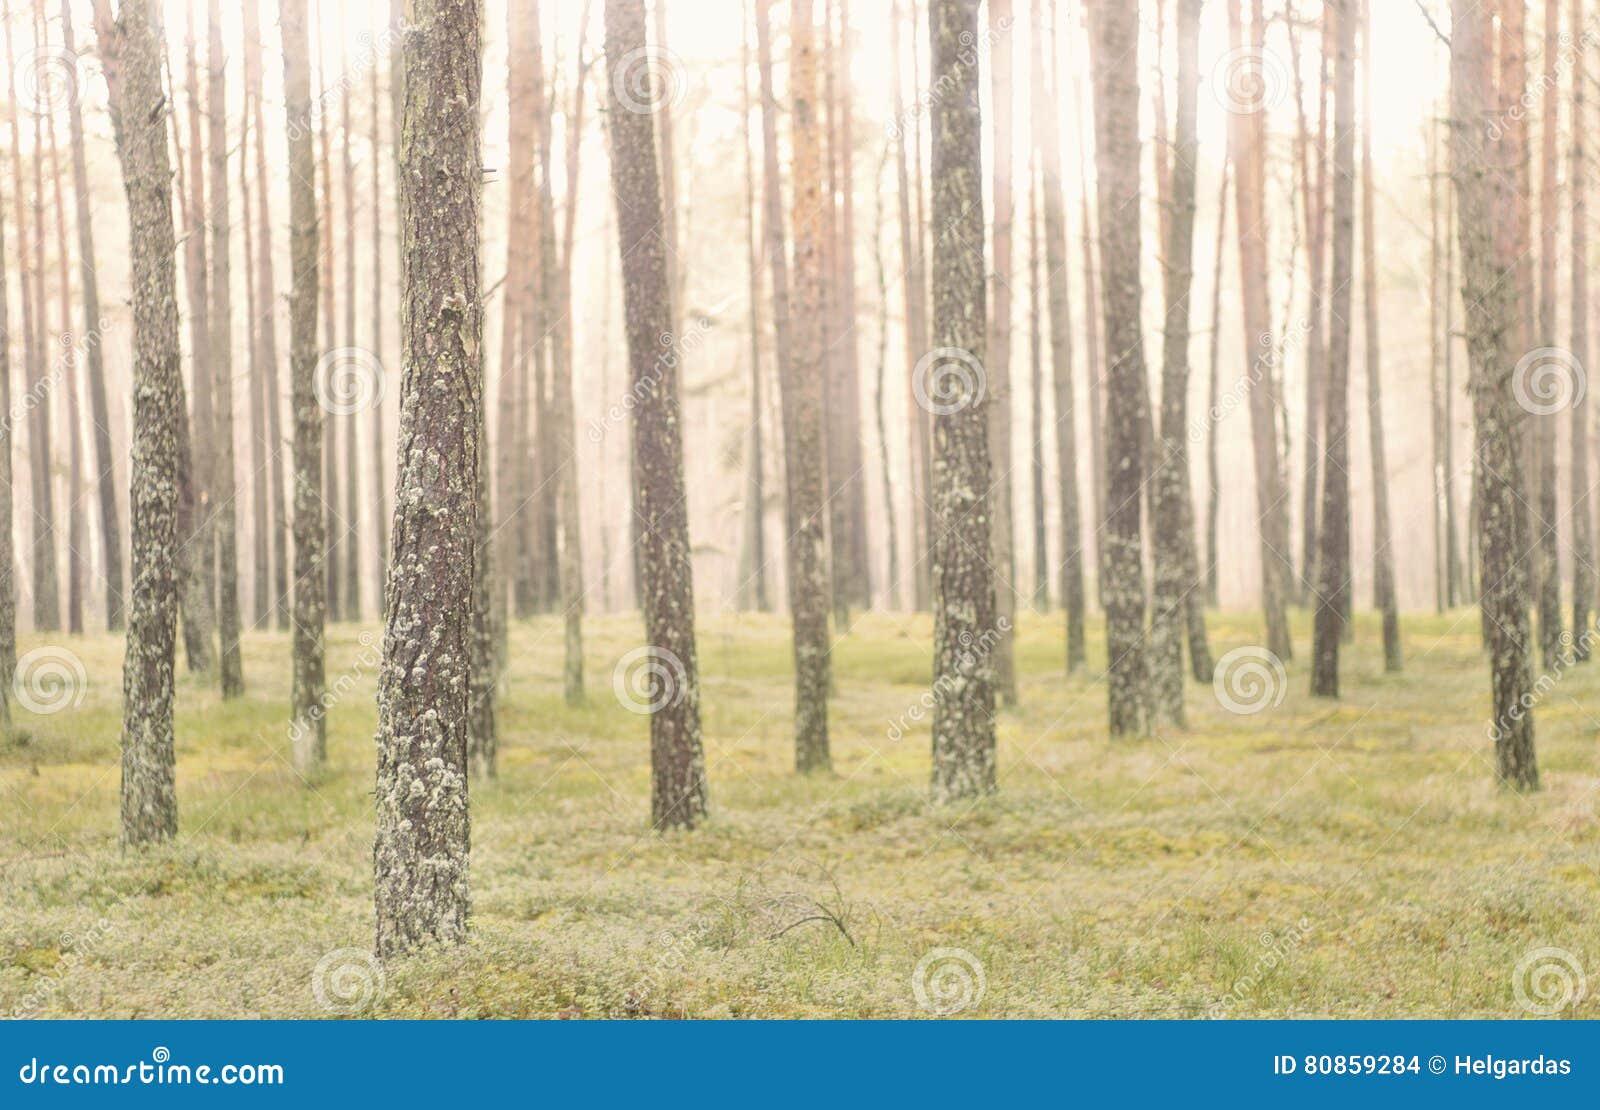 Troncos de árbol de pino en bosque